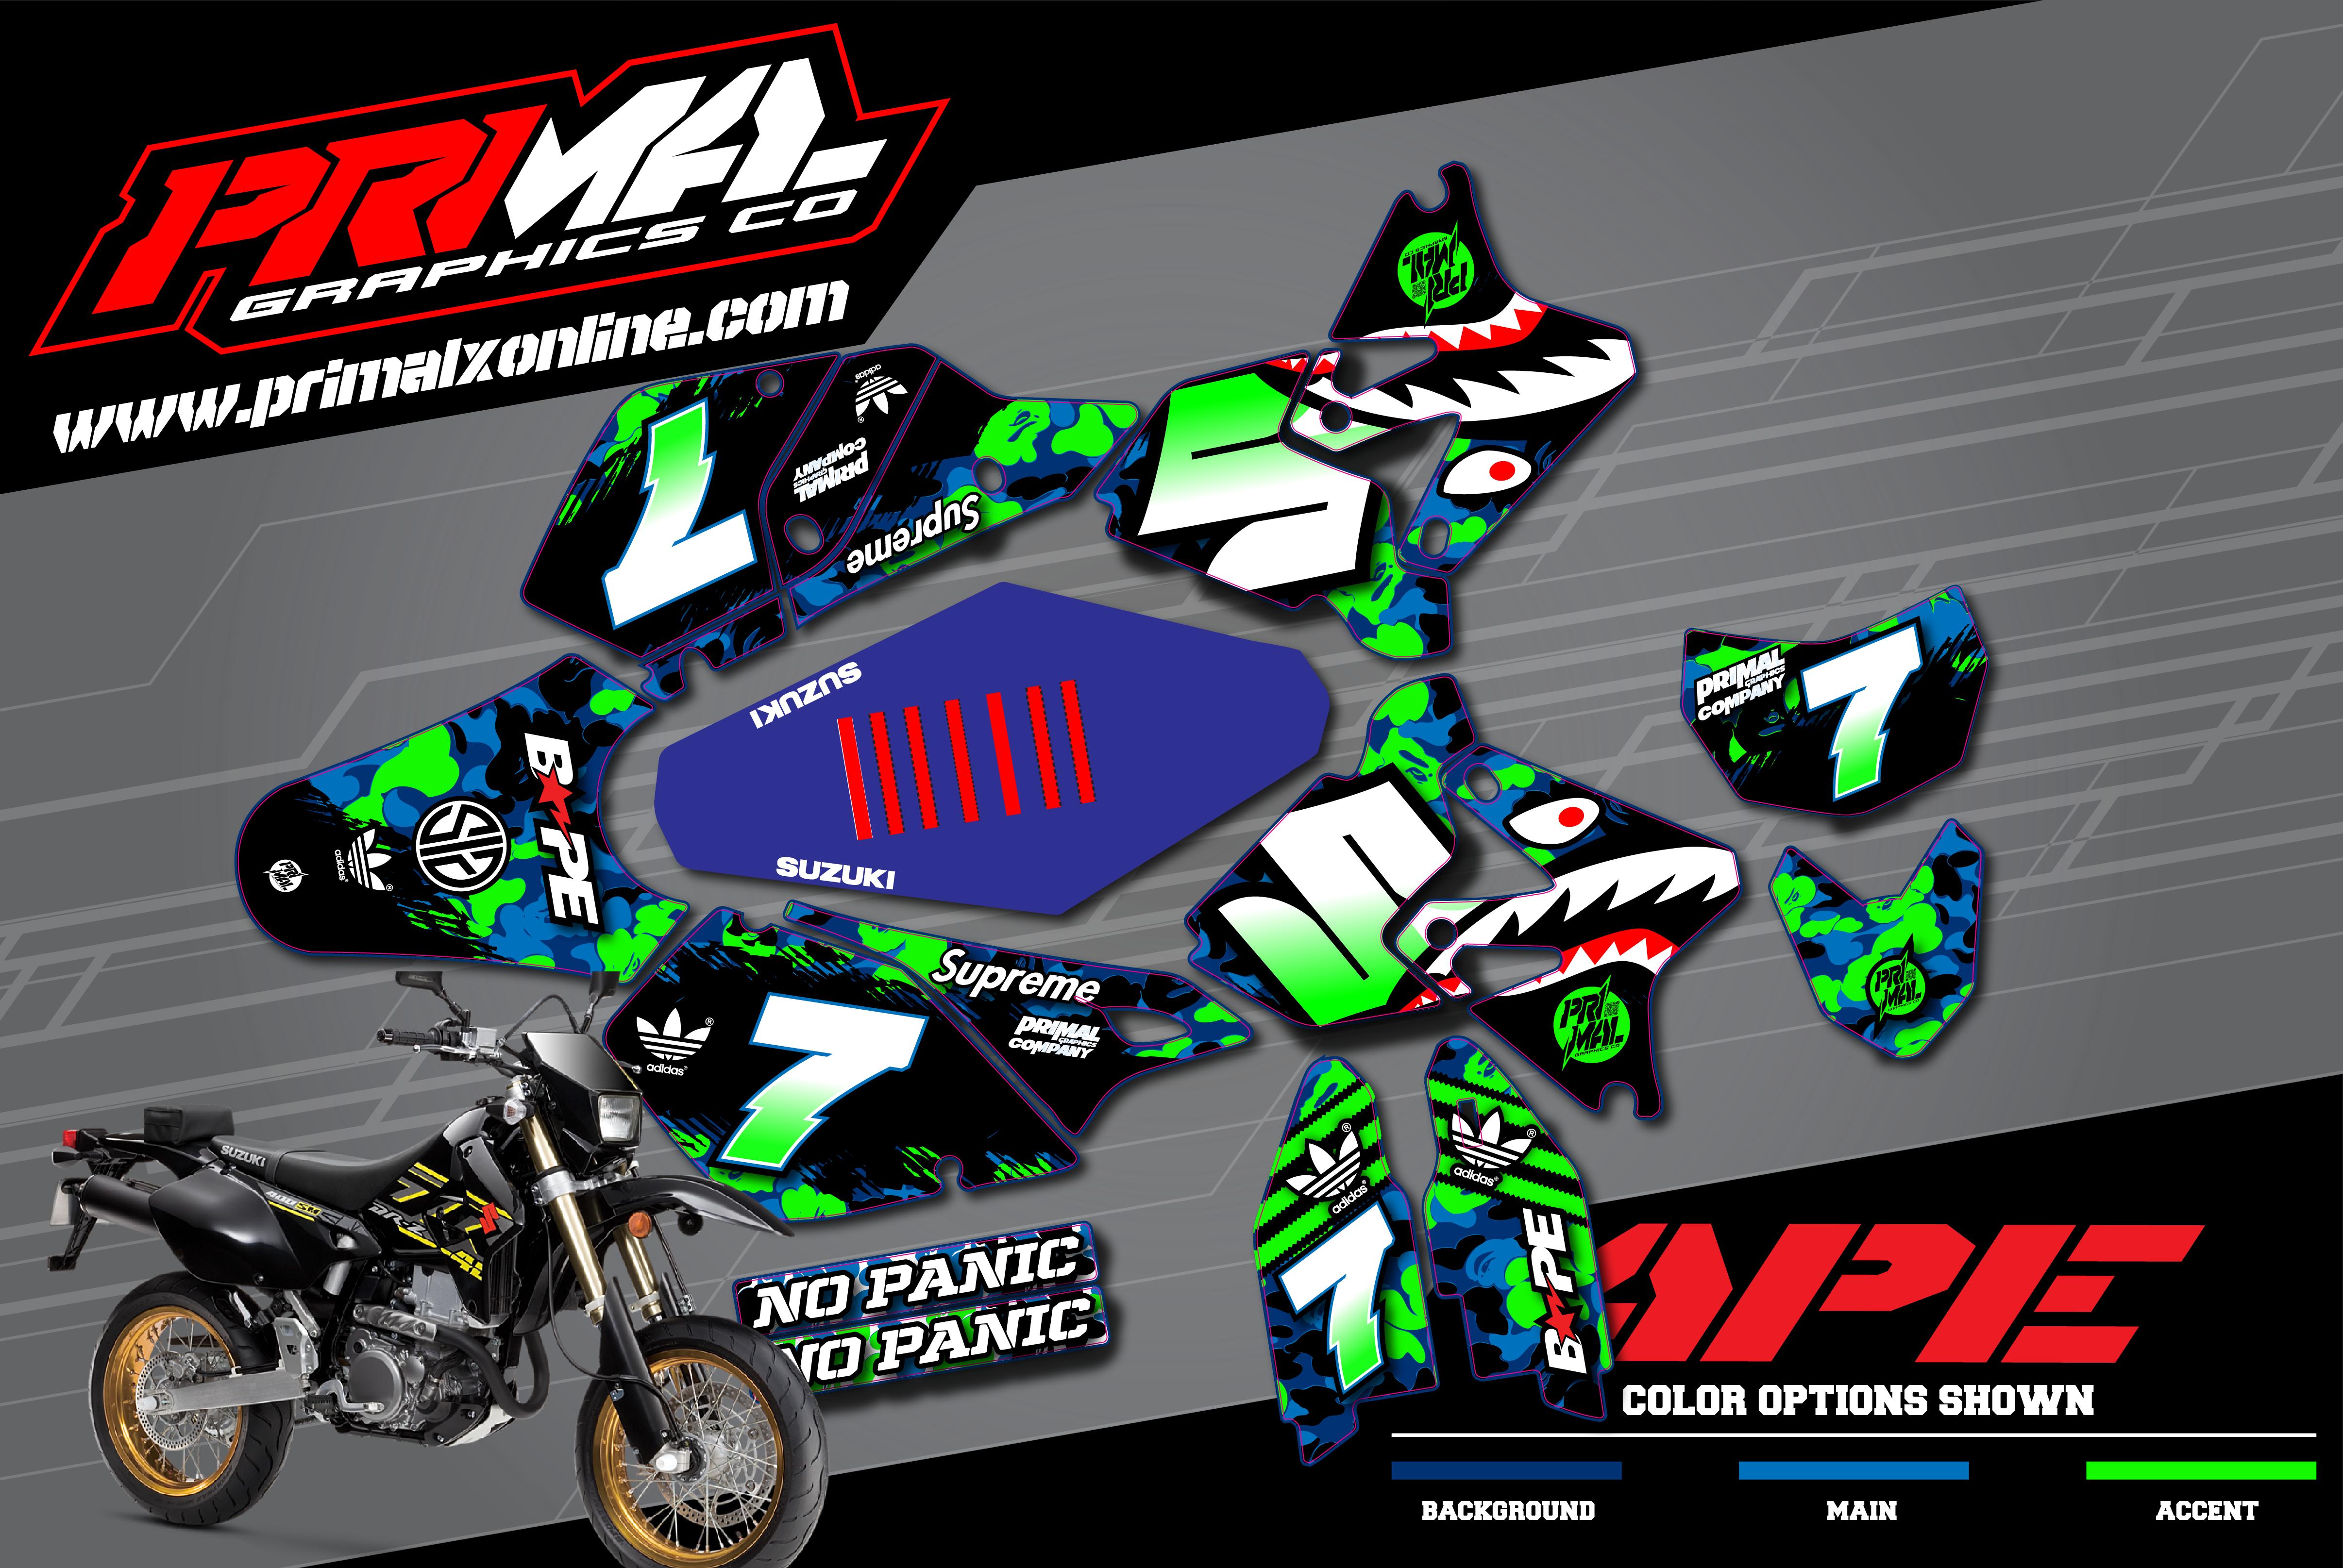 1_PRIMAL-X-MOTORSPORTS-PRIMAL-GRAPHICS-CO-SUZUKI-DRZ400SM-SUPERMOTO-MOTOCROSS-GRAPHICS-BIKELIFE-CHARMCITY-NEW-01